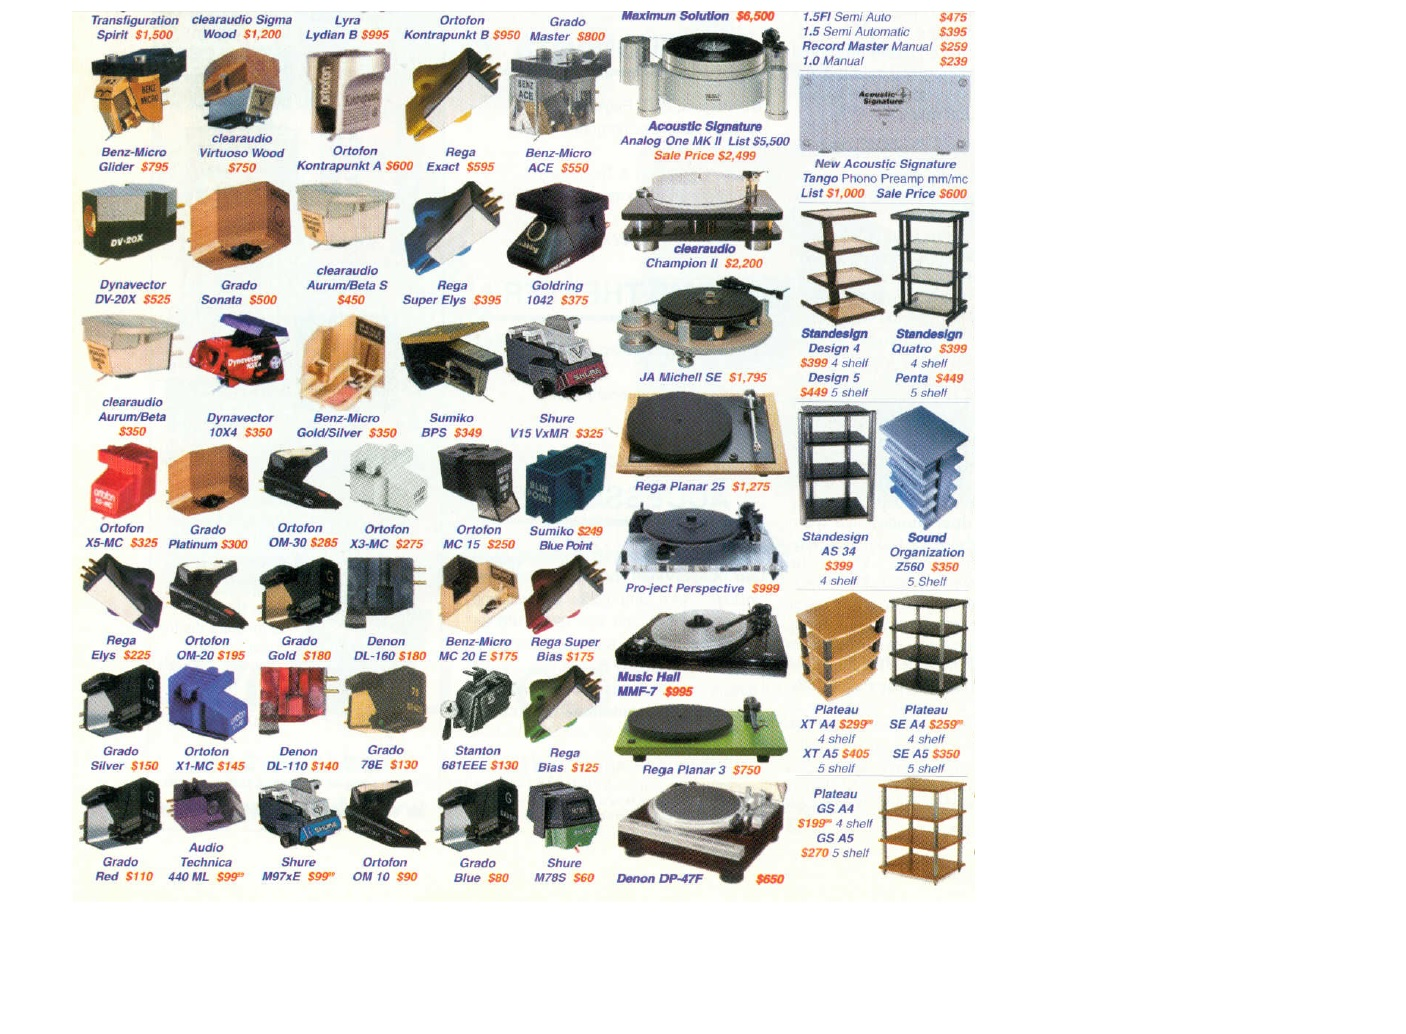 Cápsula MM para Technics 1200 - Página 8 Capsulas_2002_jpg_mtc6